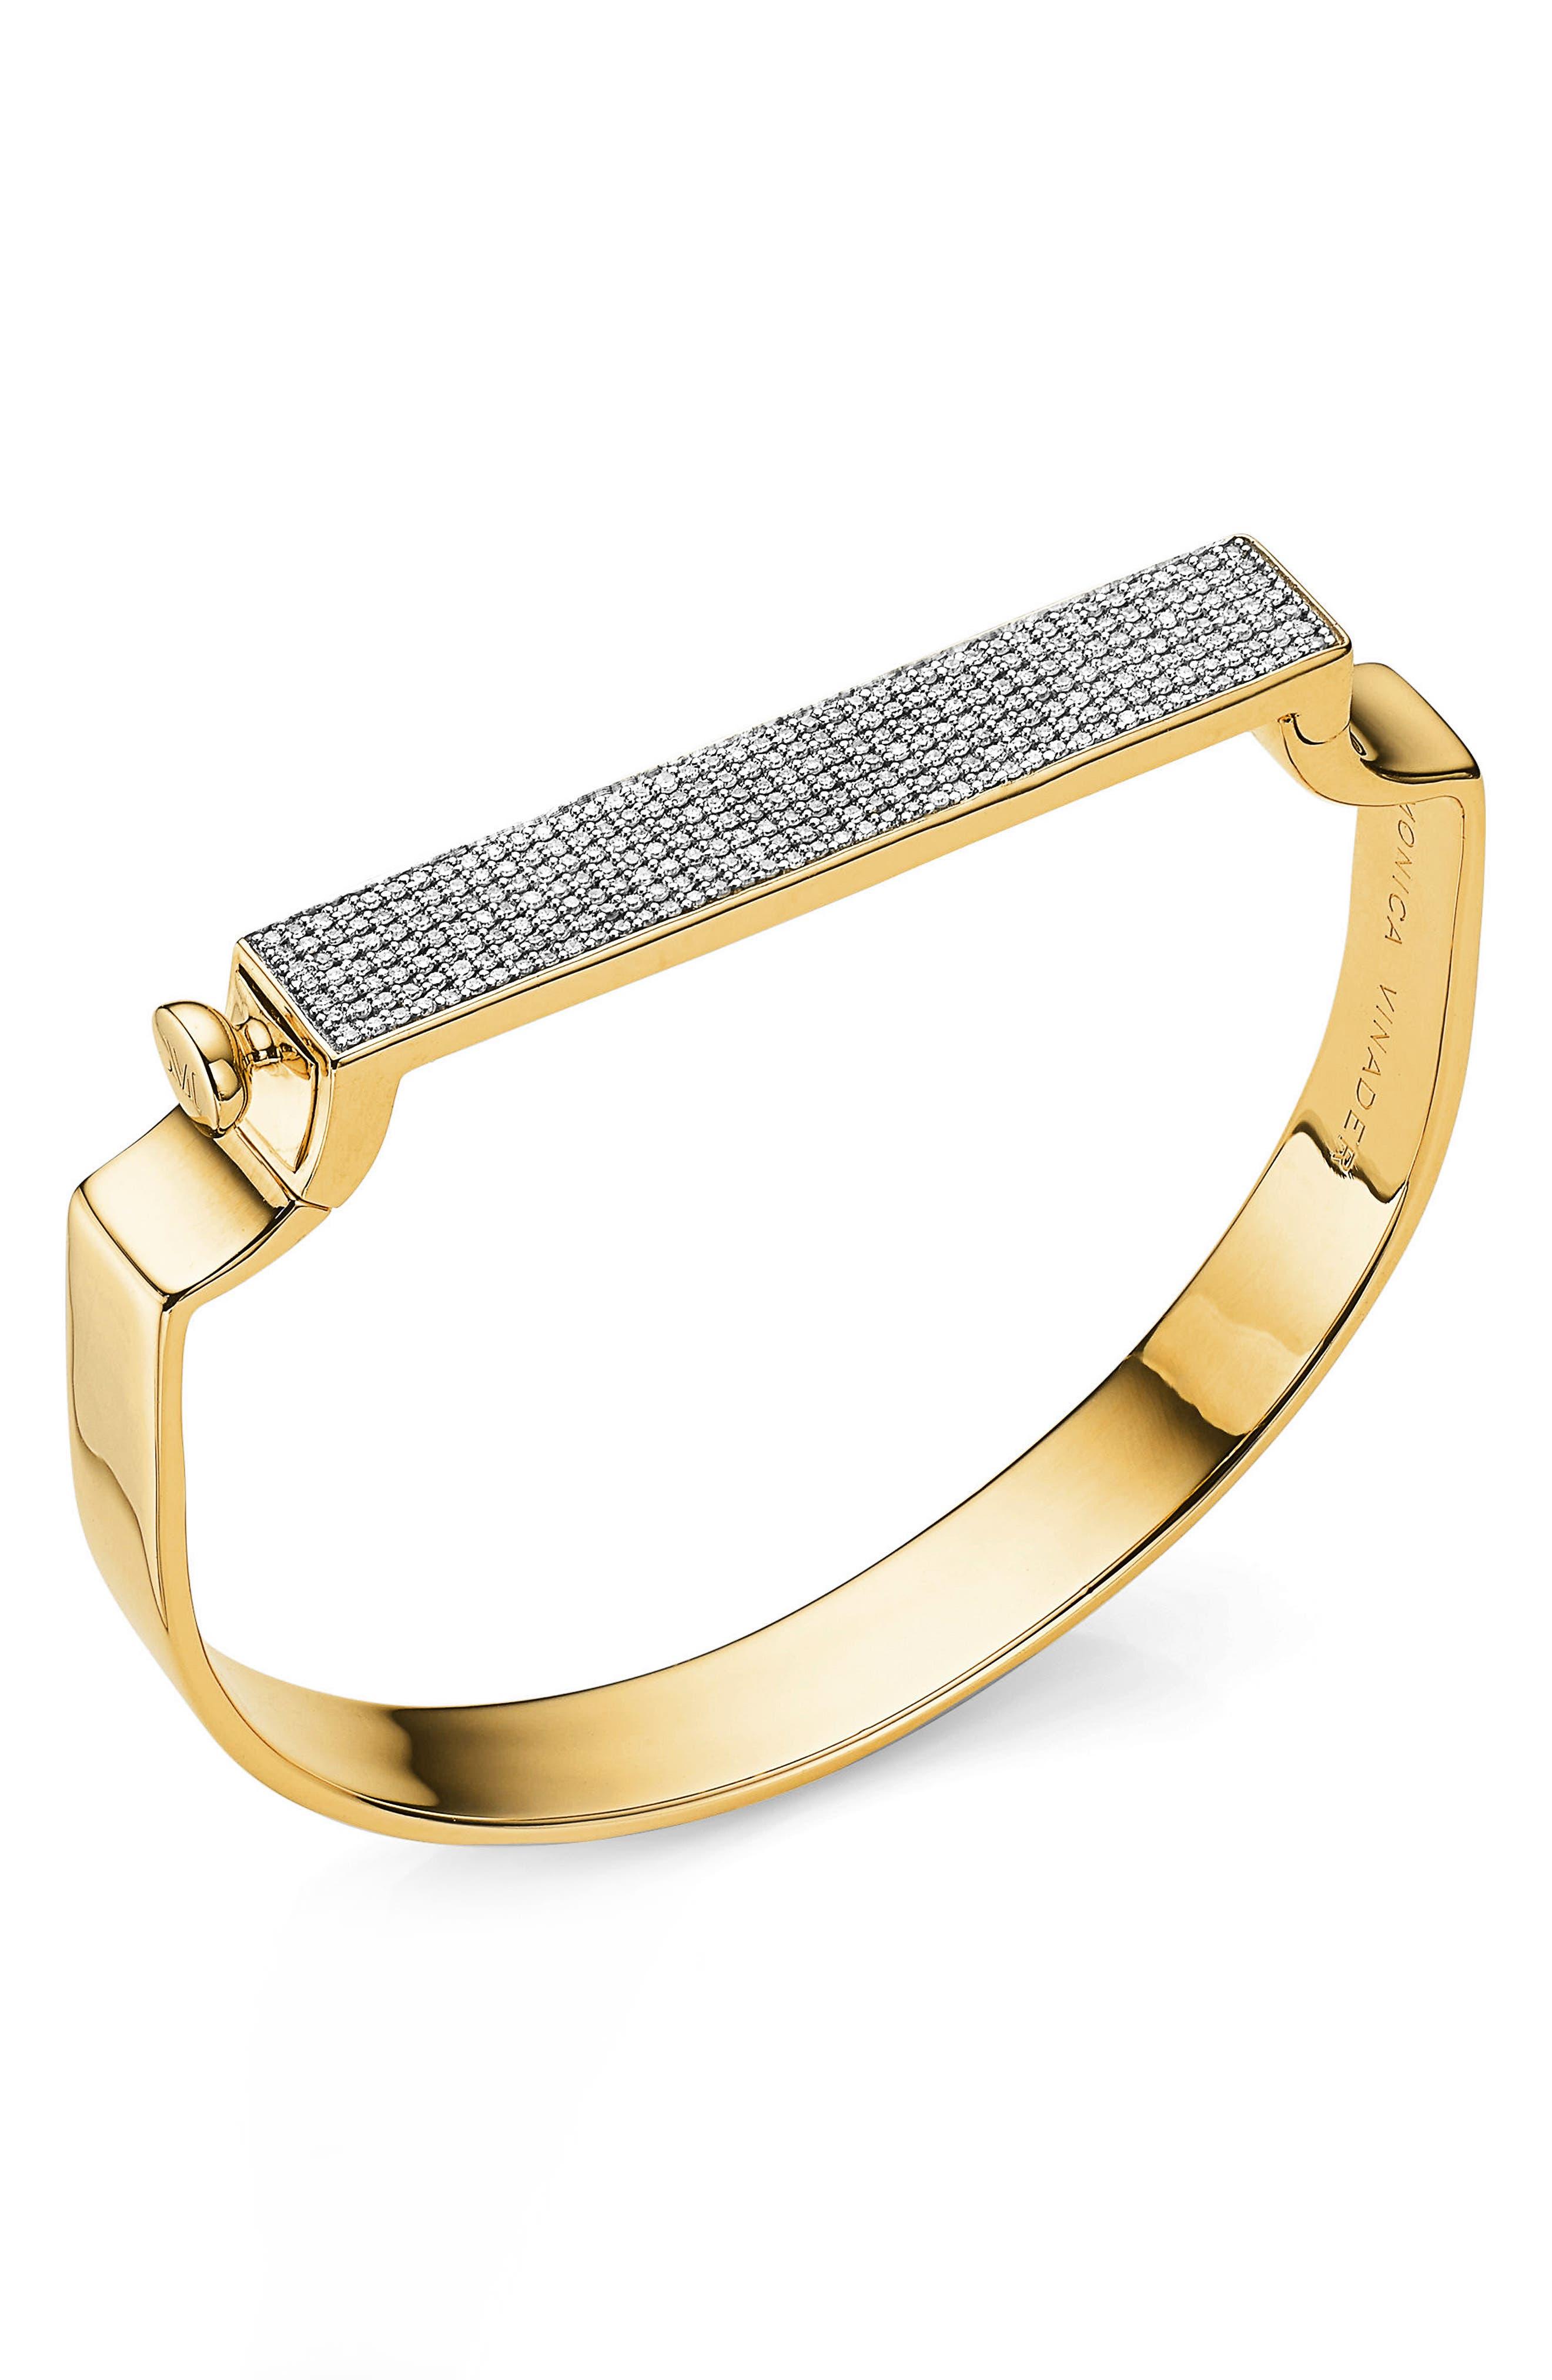 Signature Diamond Bangle,                             Main thumbnail 1, color,                             YELLOW GOLD